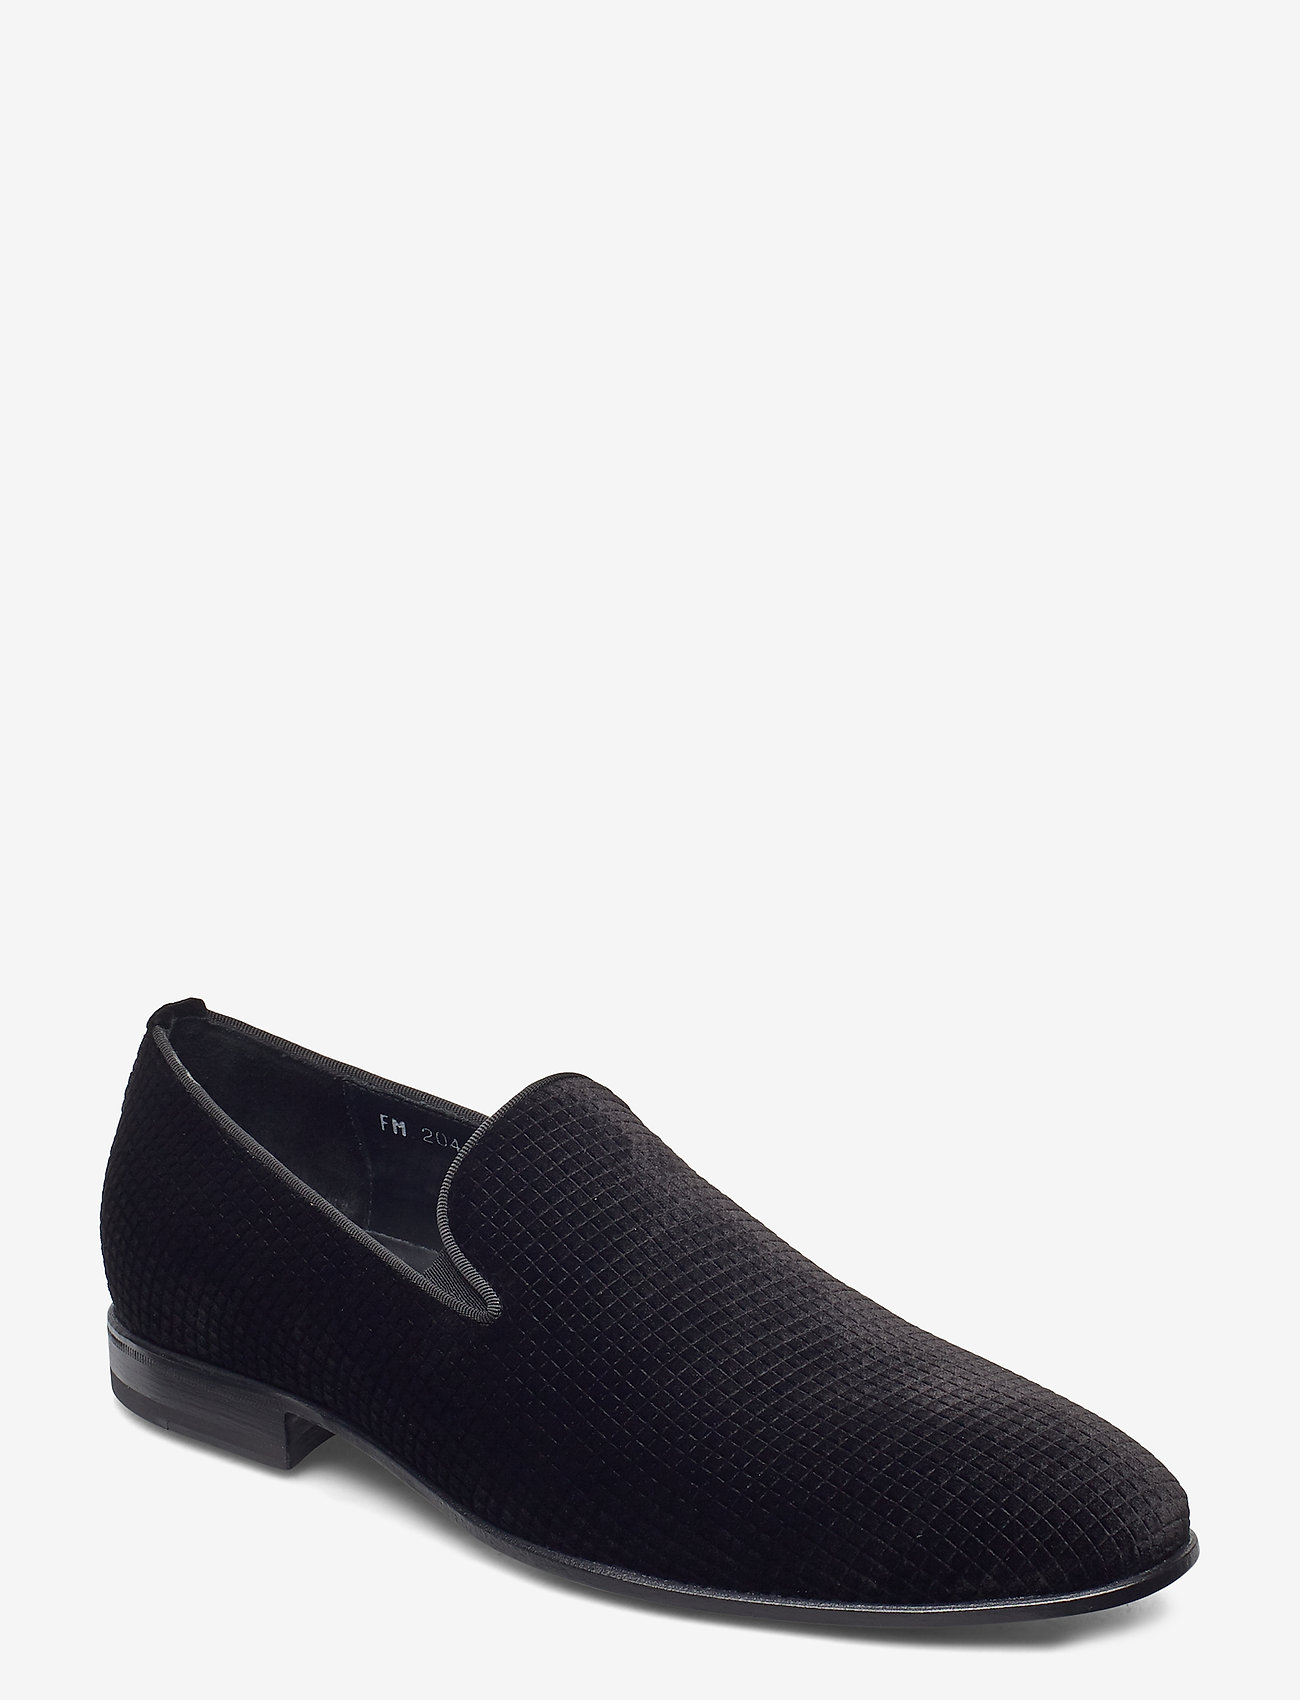 SAND - Footwear MW - F898 - loafers - black - 0